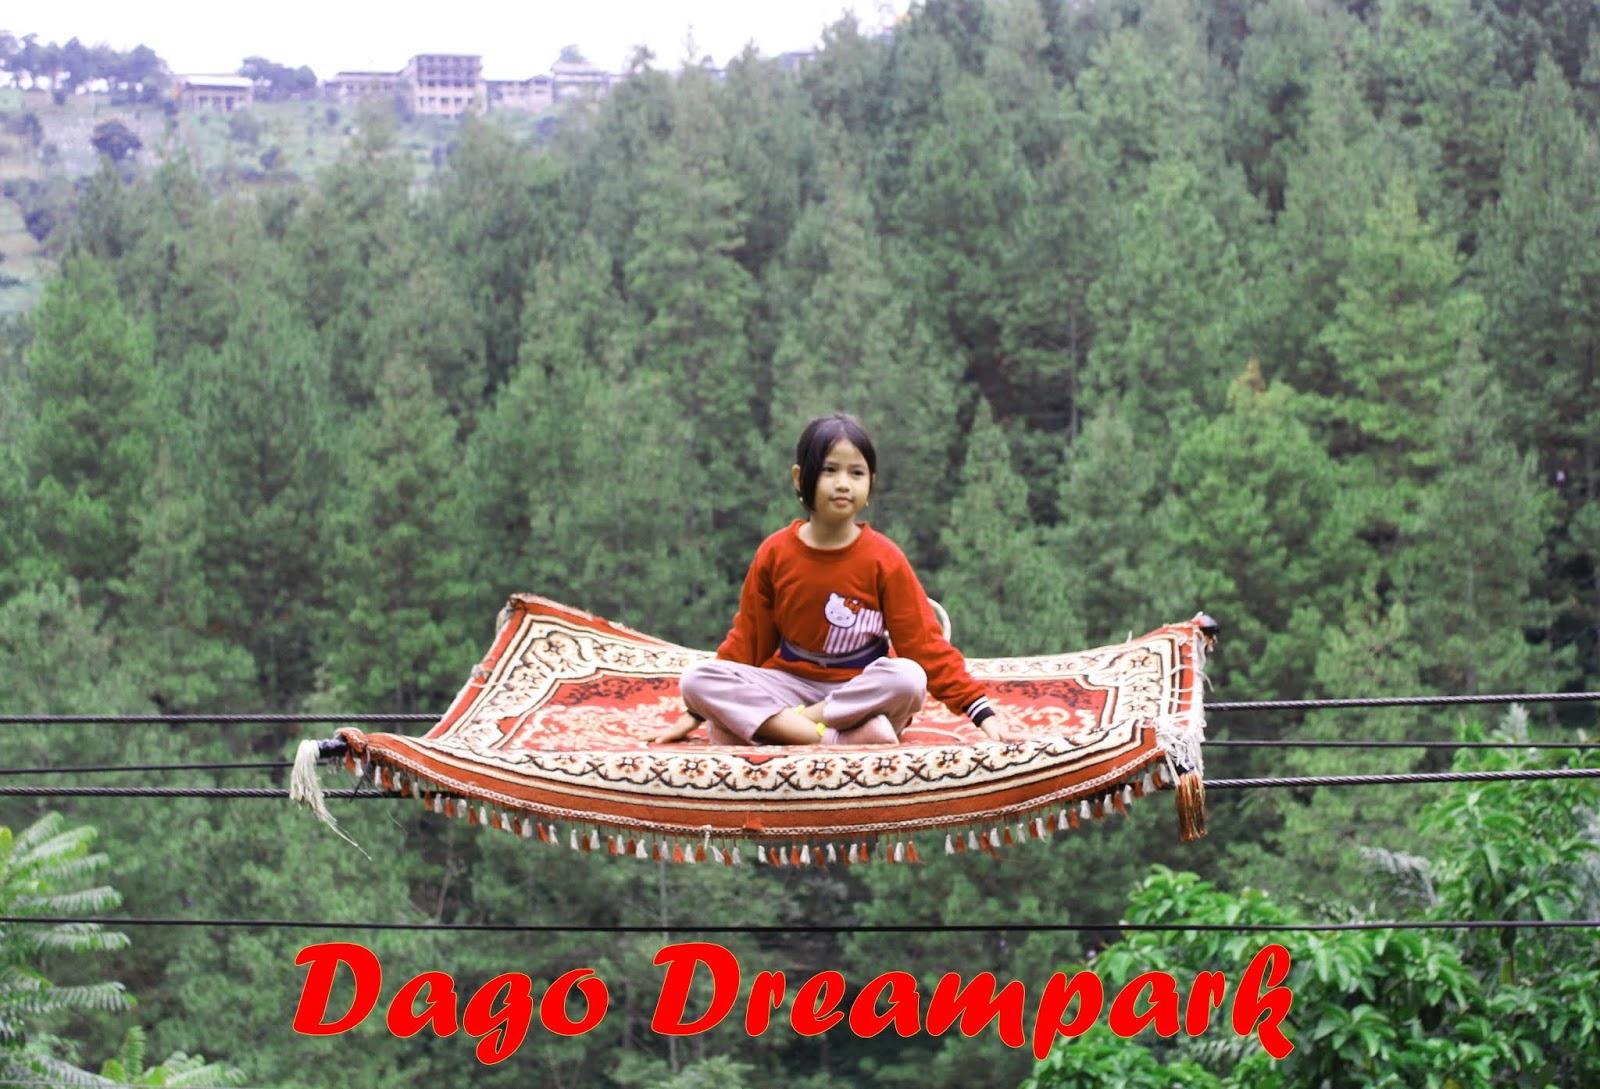 Dago Dreampark, Destinasi Wisata Paling Kekinian di Bandung